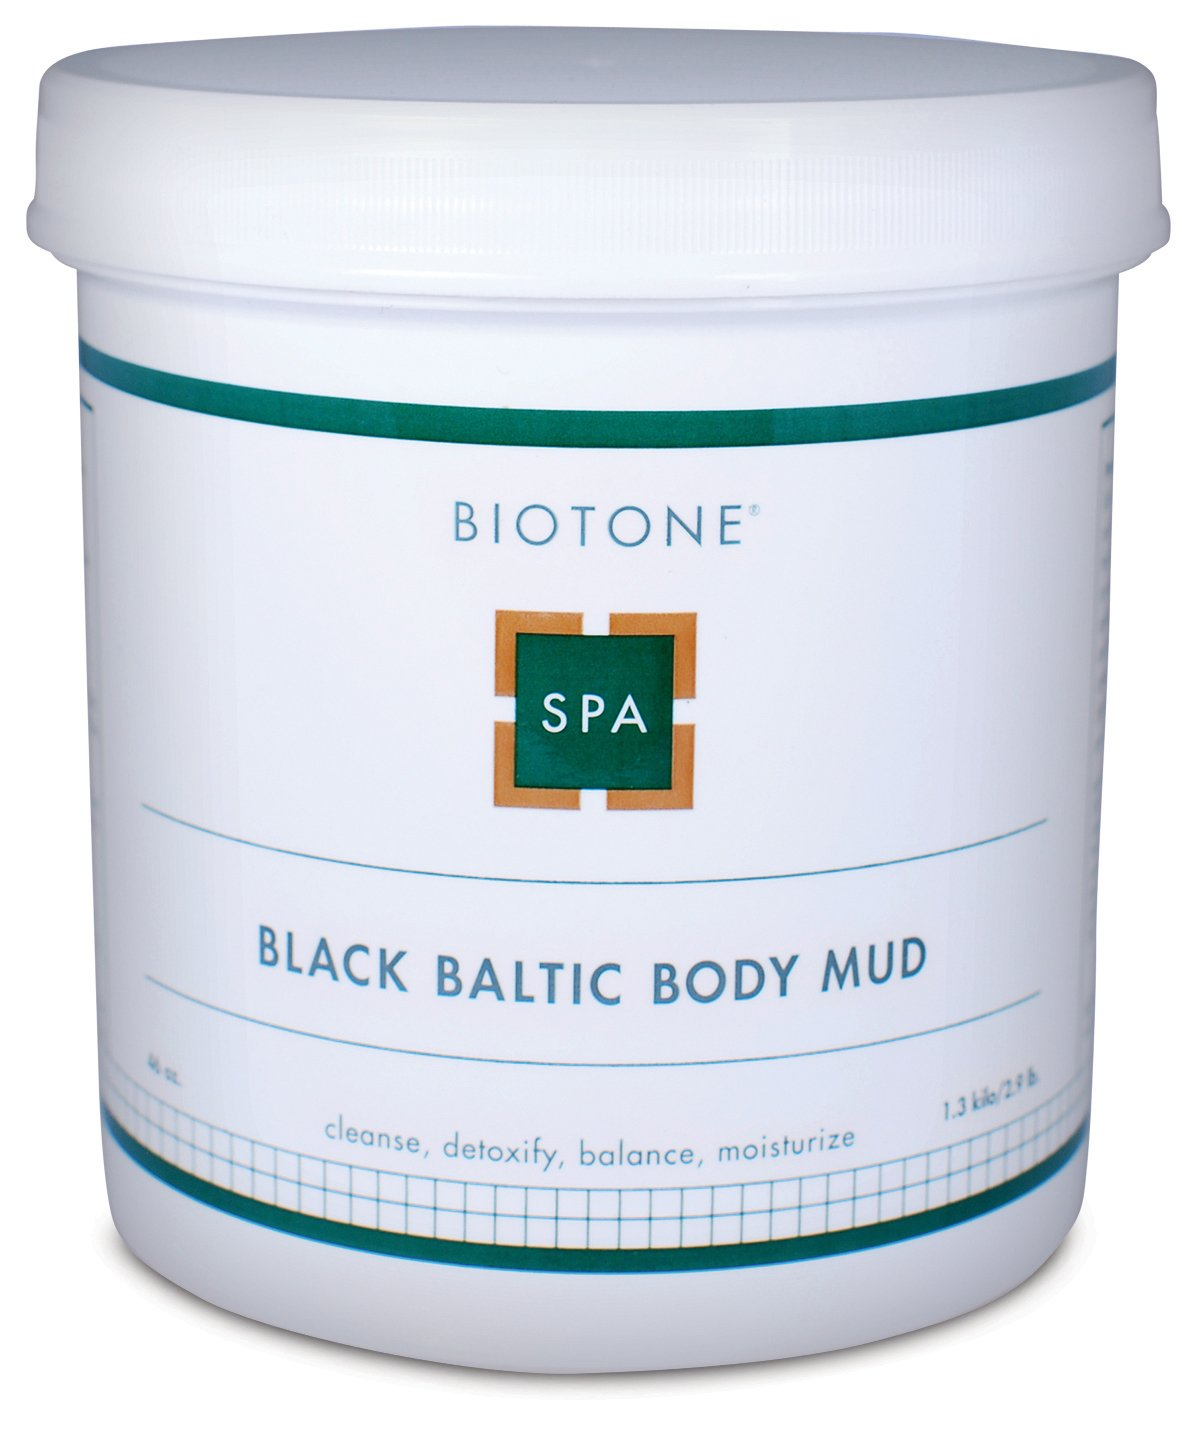 Biotone Black Baltic Body Mud, 46 Ounce by Biotone